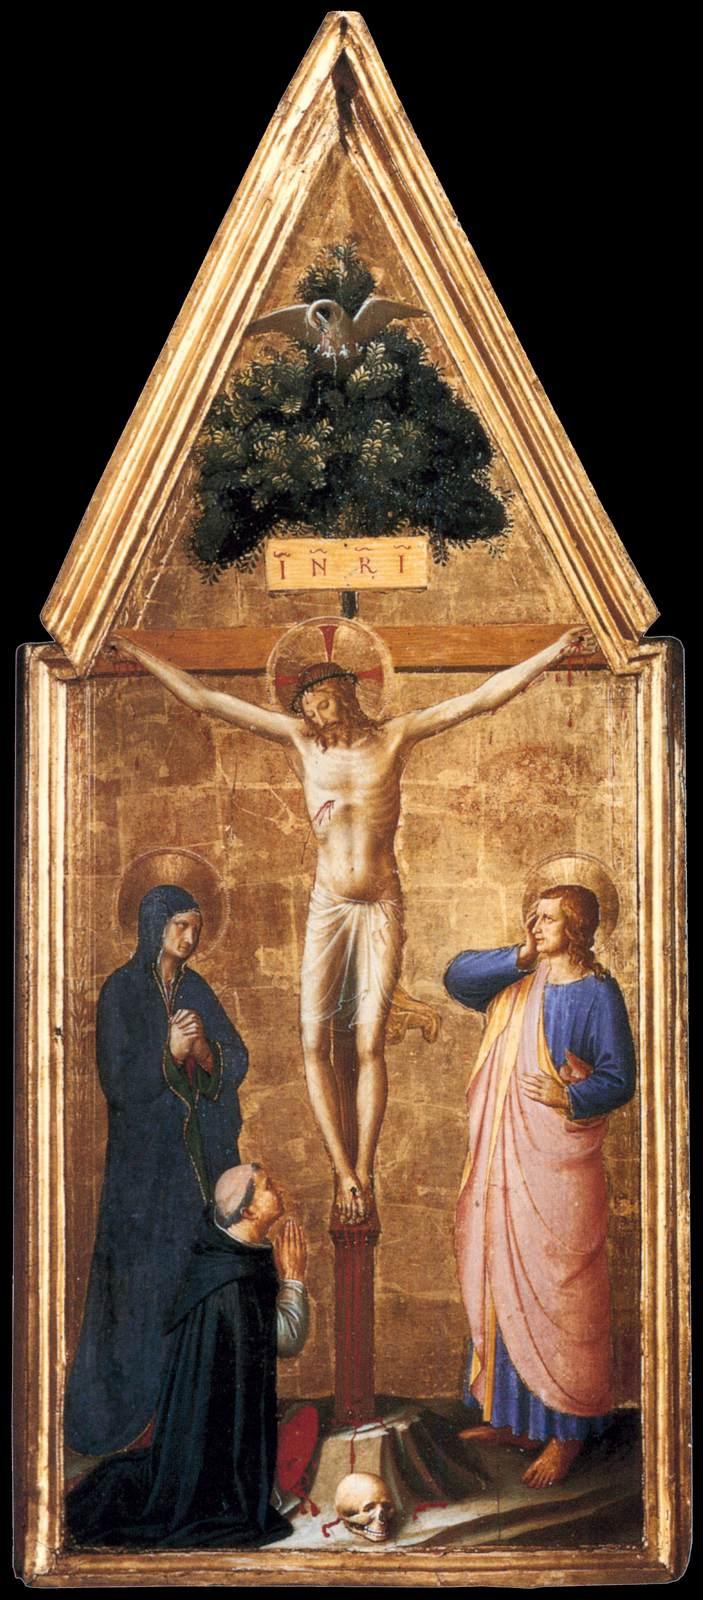 Fra_Angelico_-_Crucified_Christ_with_the_Virgin,_St_John_the_Evangelist_and_Cardinal_Juan_de_Torquemada